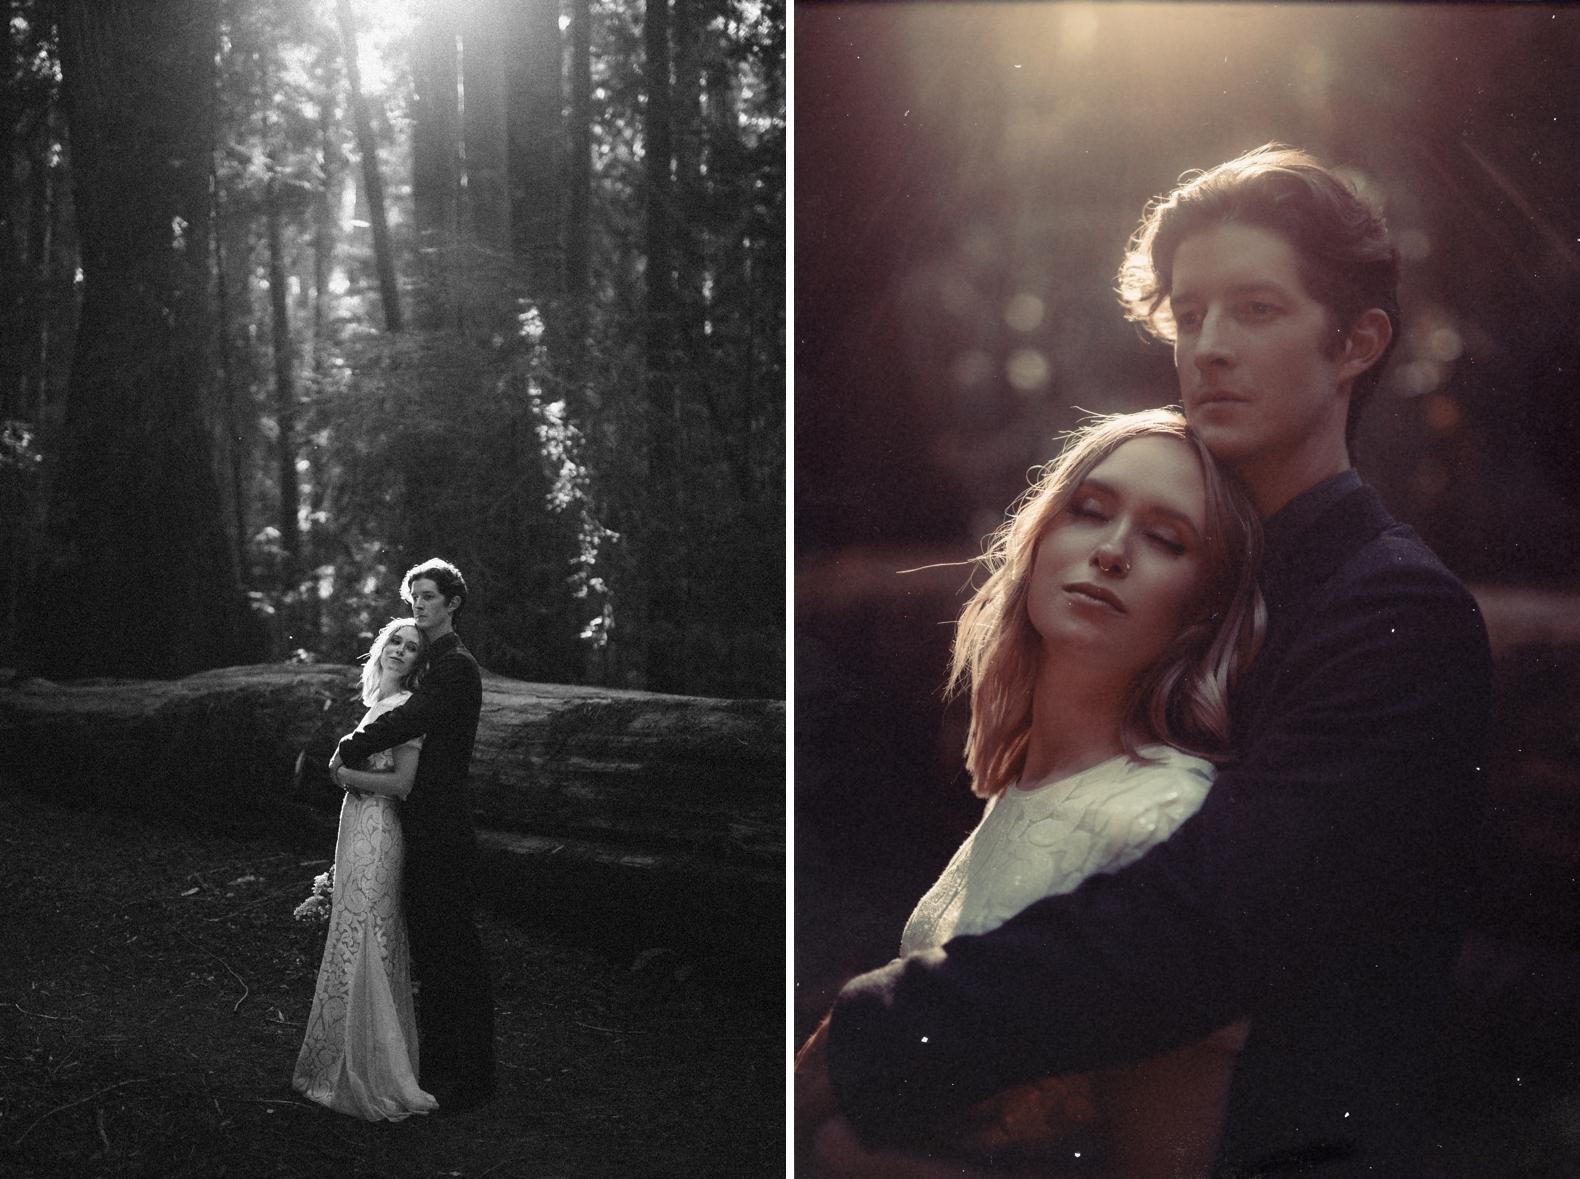 redwood-forest-elopement-0033